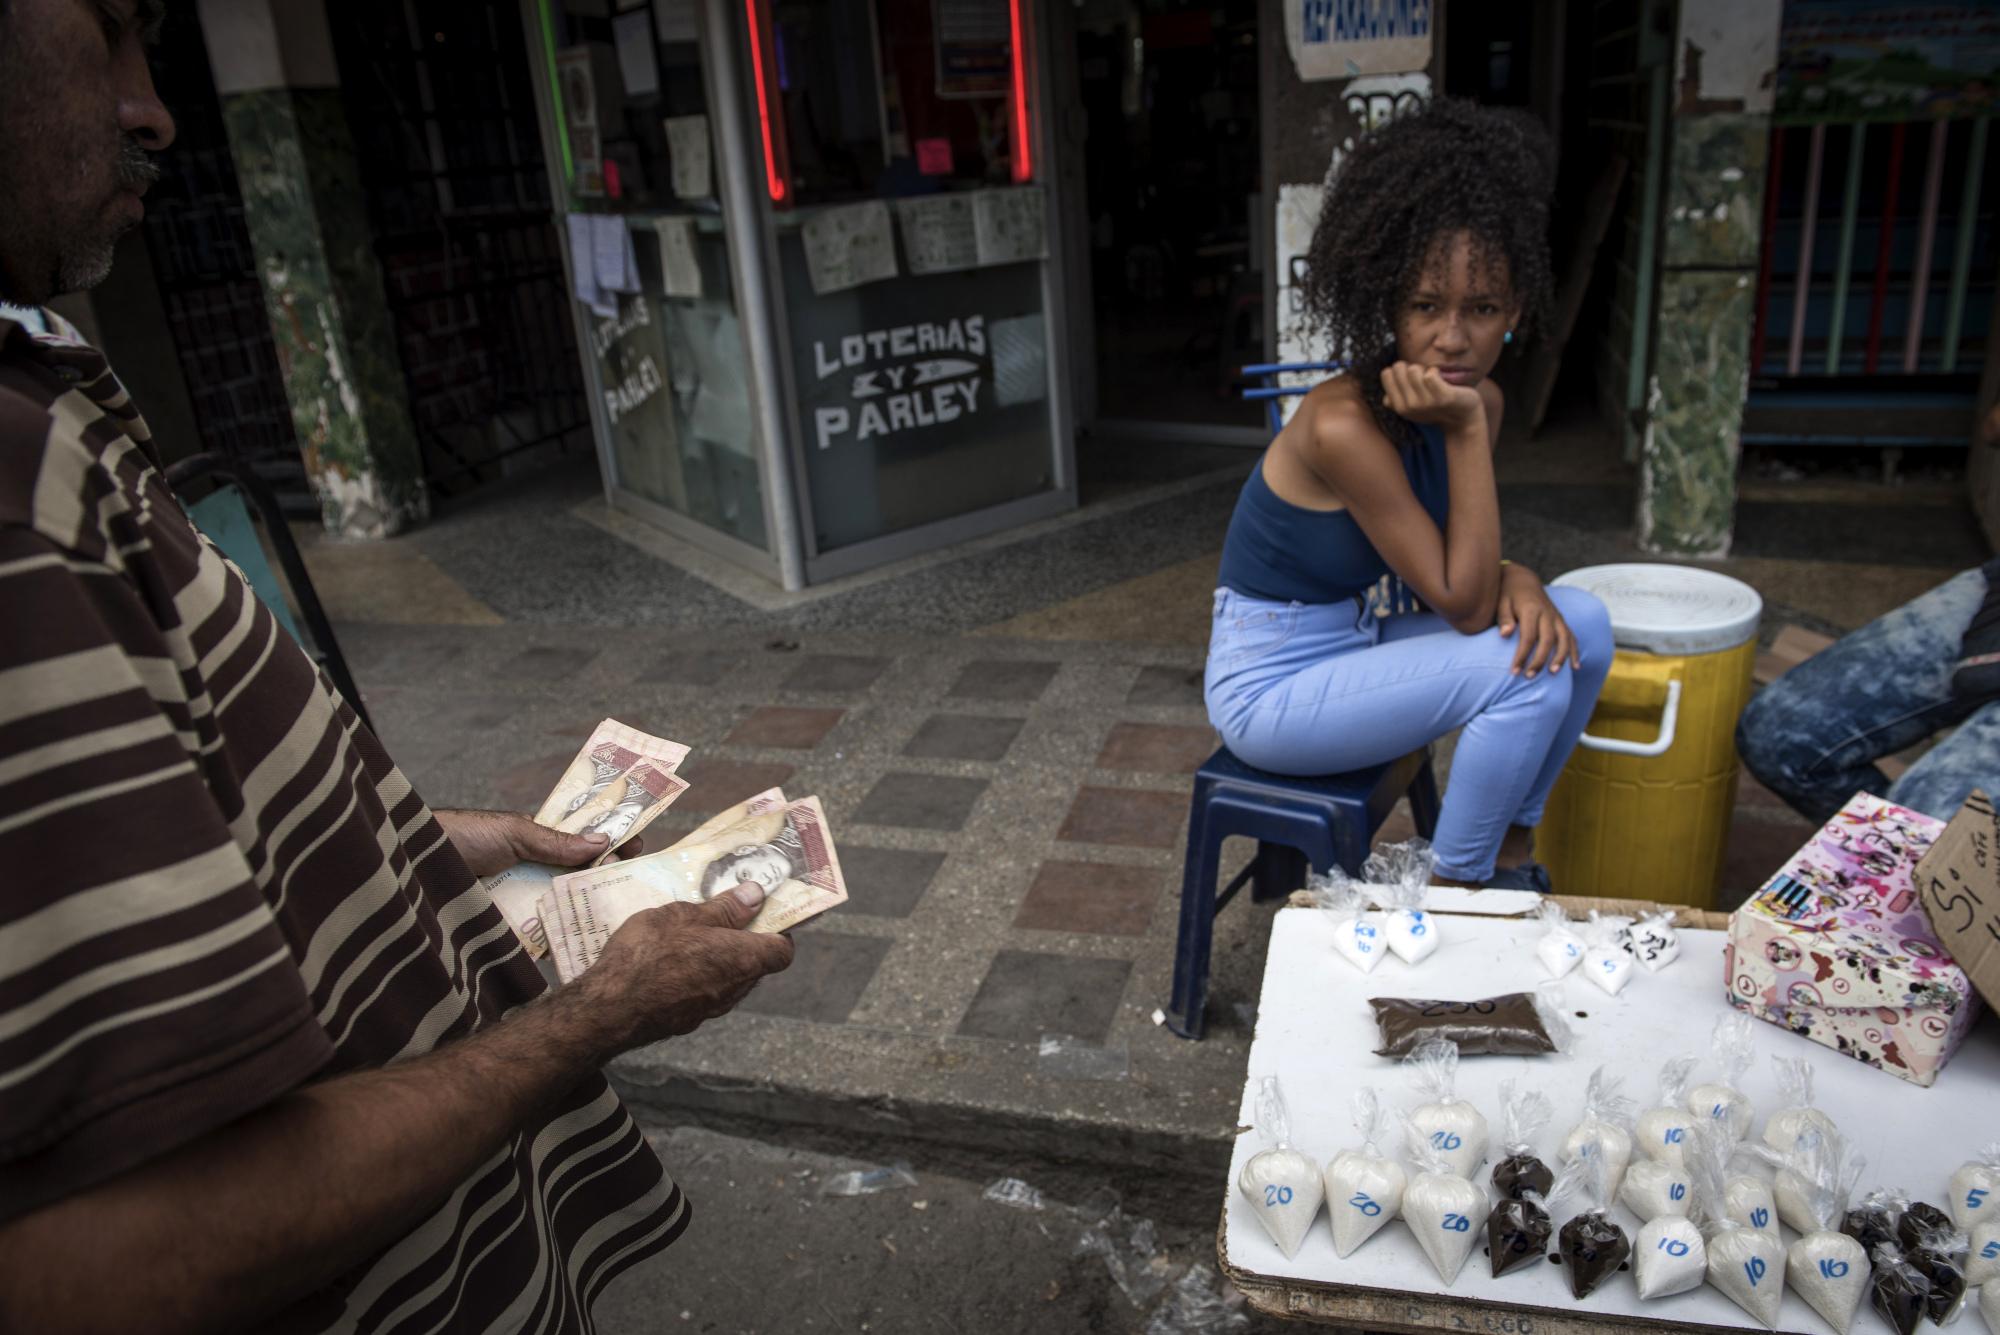 bloomberg.com - Michelle Jamrisko - The World's Most Miserable Economy Has Seven-Figure Inflation